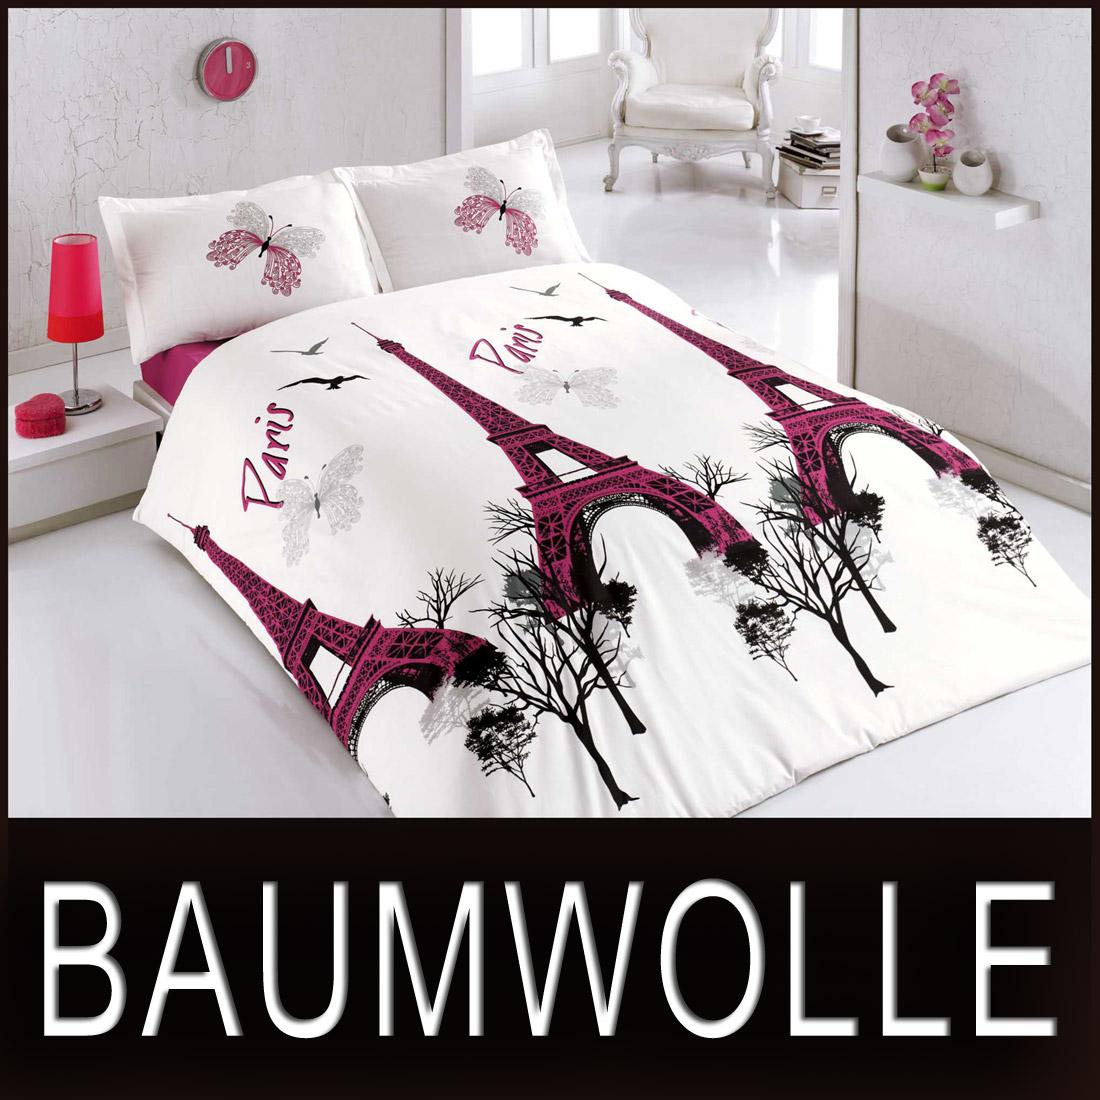 5 tlg bettw sche bettgarnitur baumwolle renforc 200x200 cm eifelturm paris neu ebay. Black Bedroom Furniture Sets. Home Design Ideas